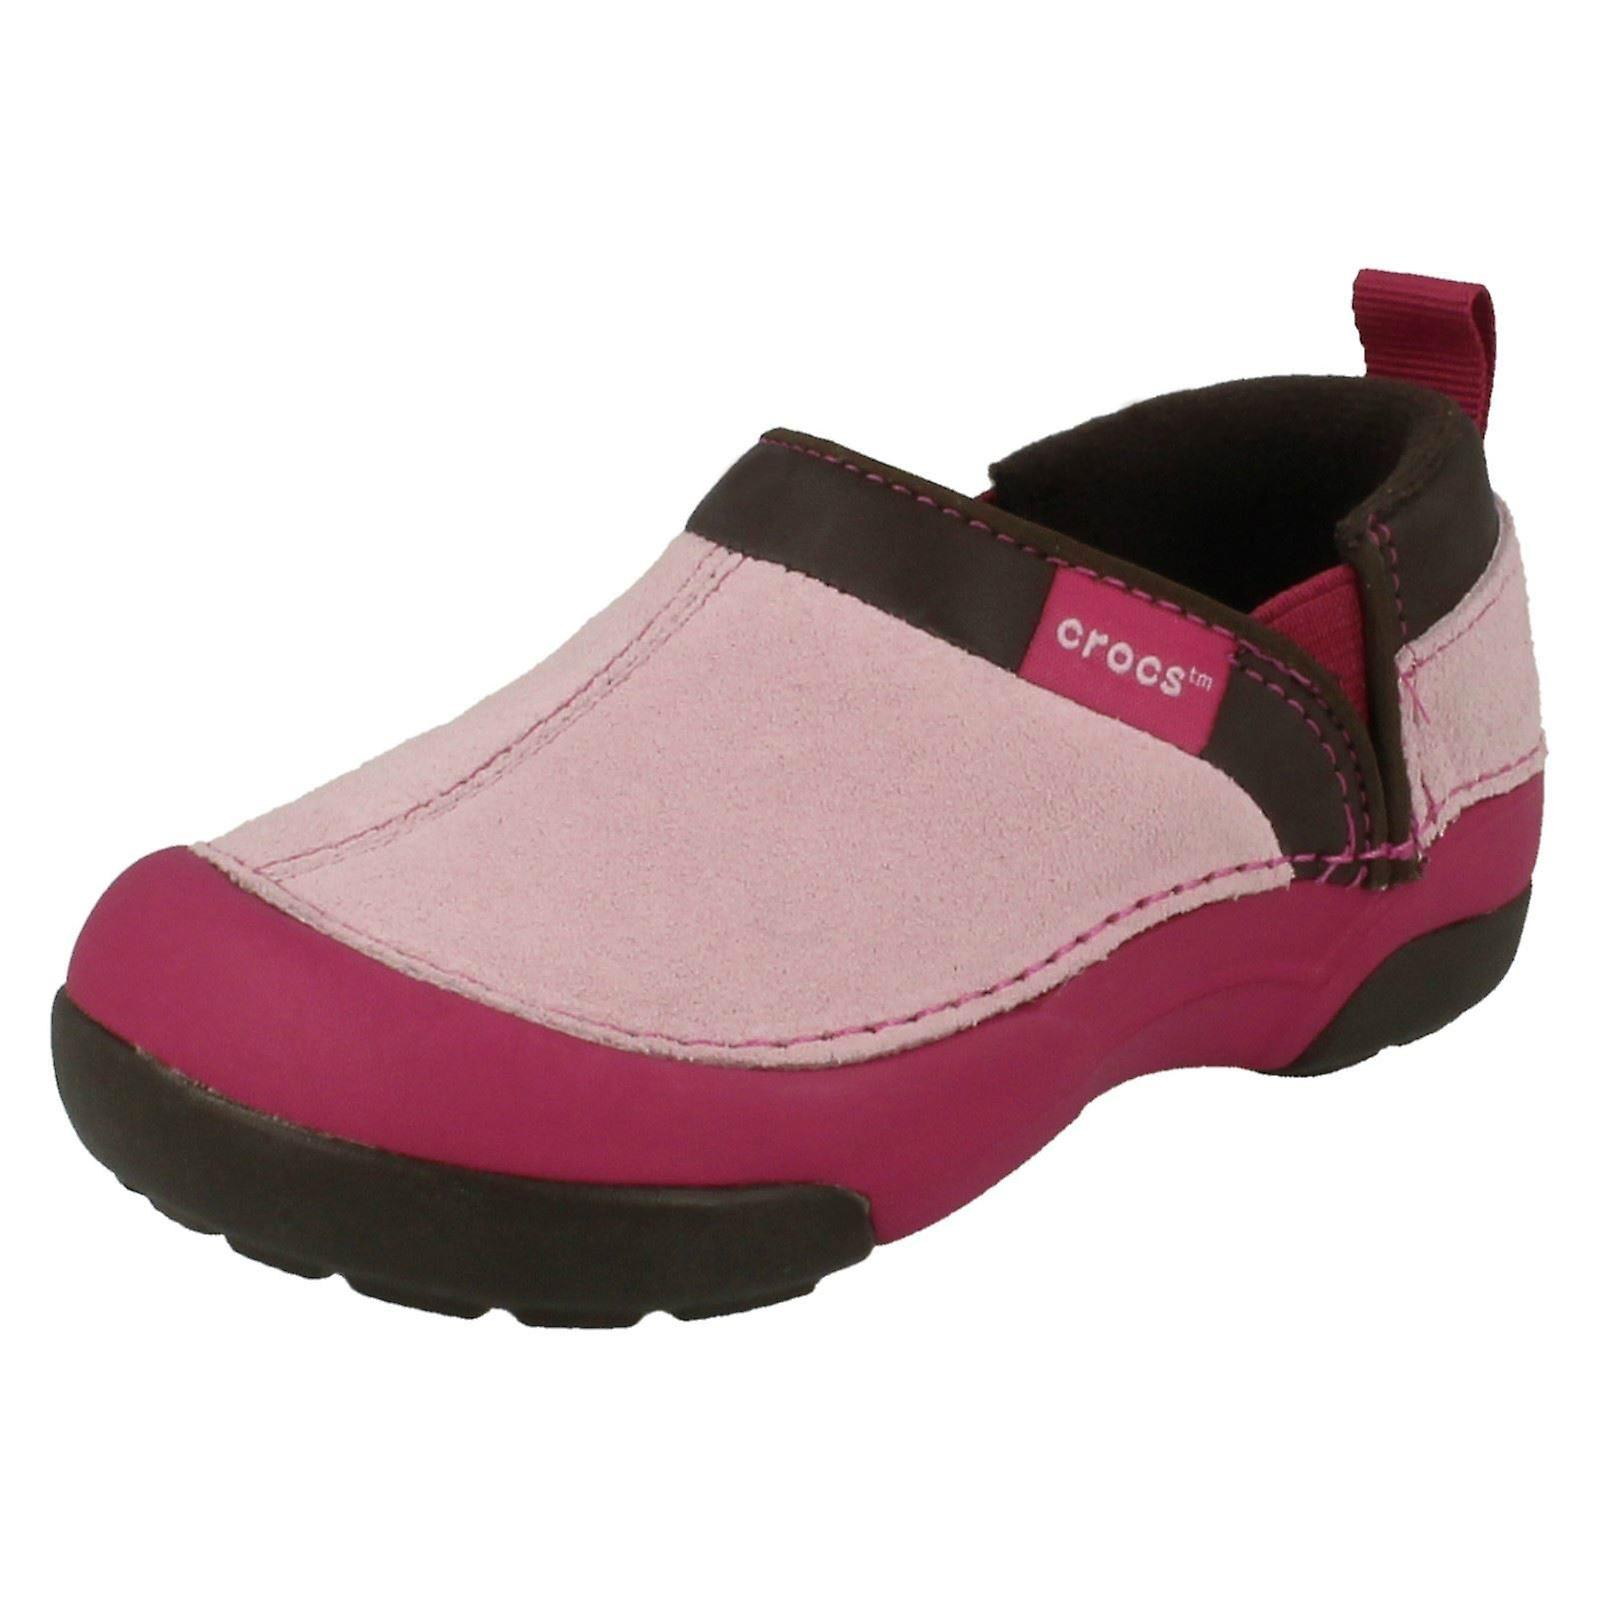 Girls Crocs Casual Flat Cunning Slip On Shoes Cunning Flat Cameron 415ecb